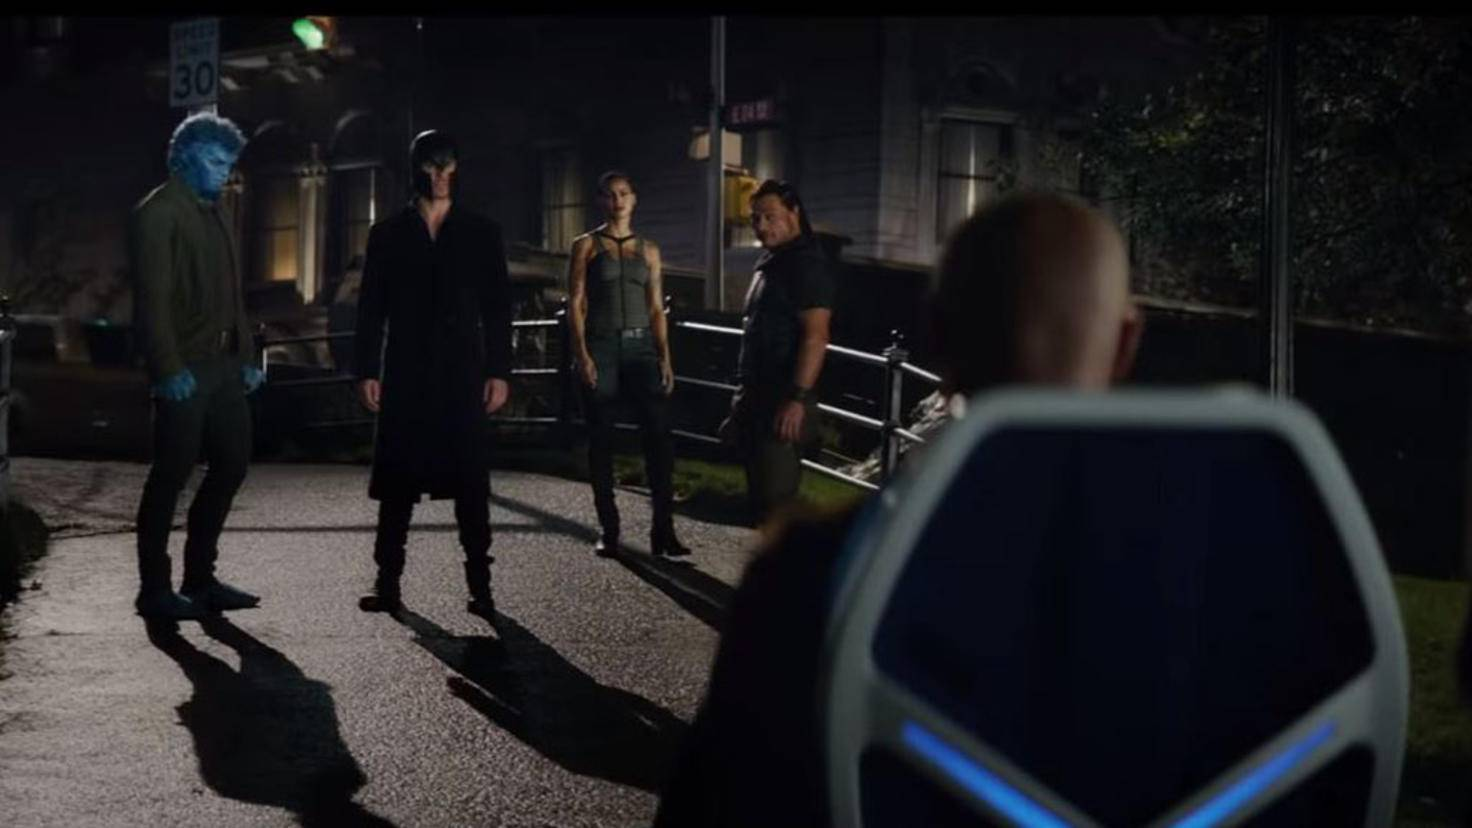 Team Magneto in X-Men Dark Phoenix FoxKino